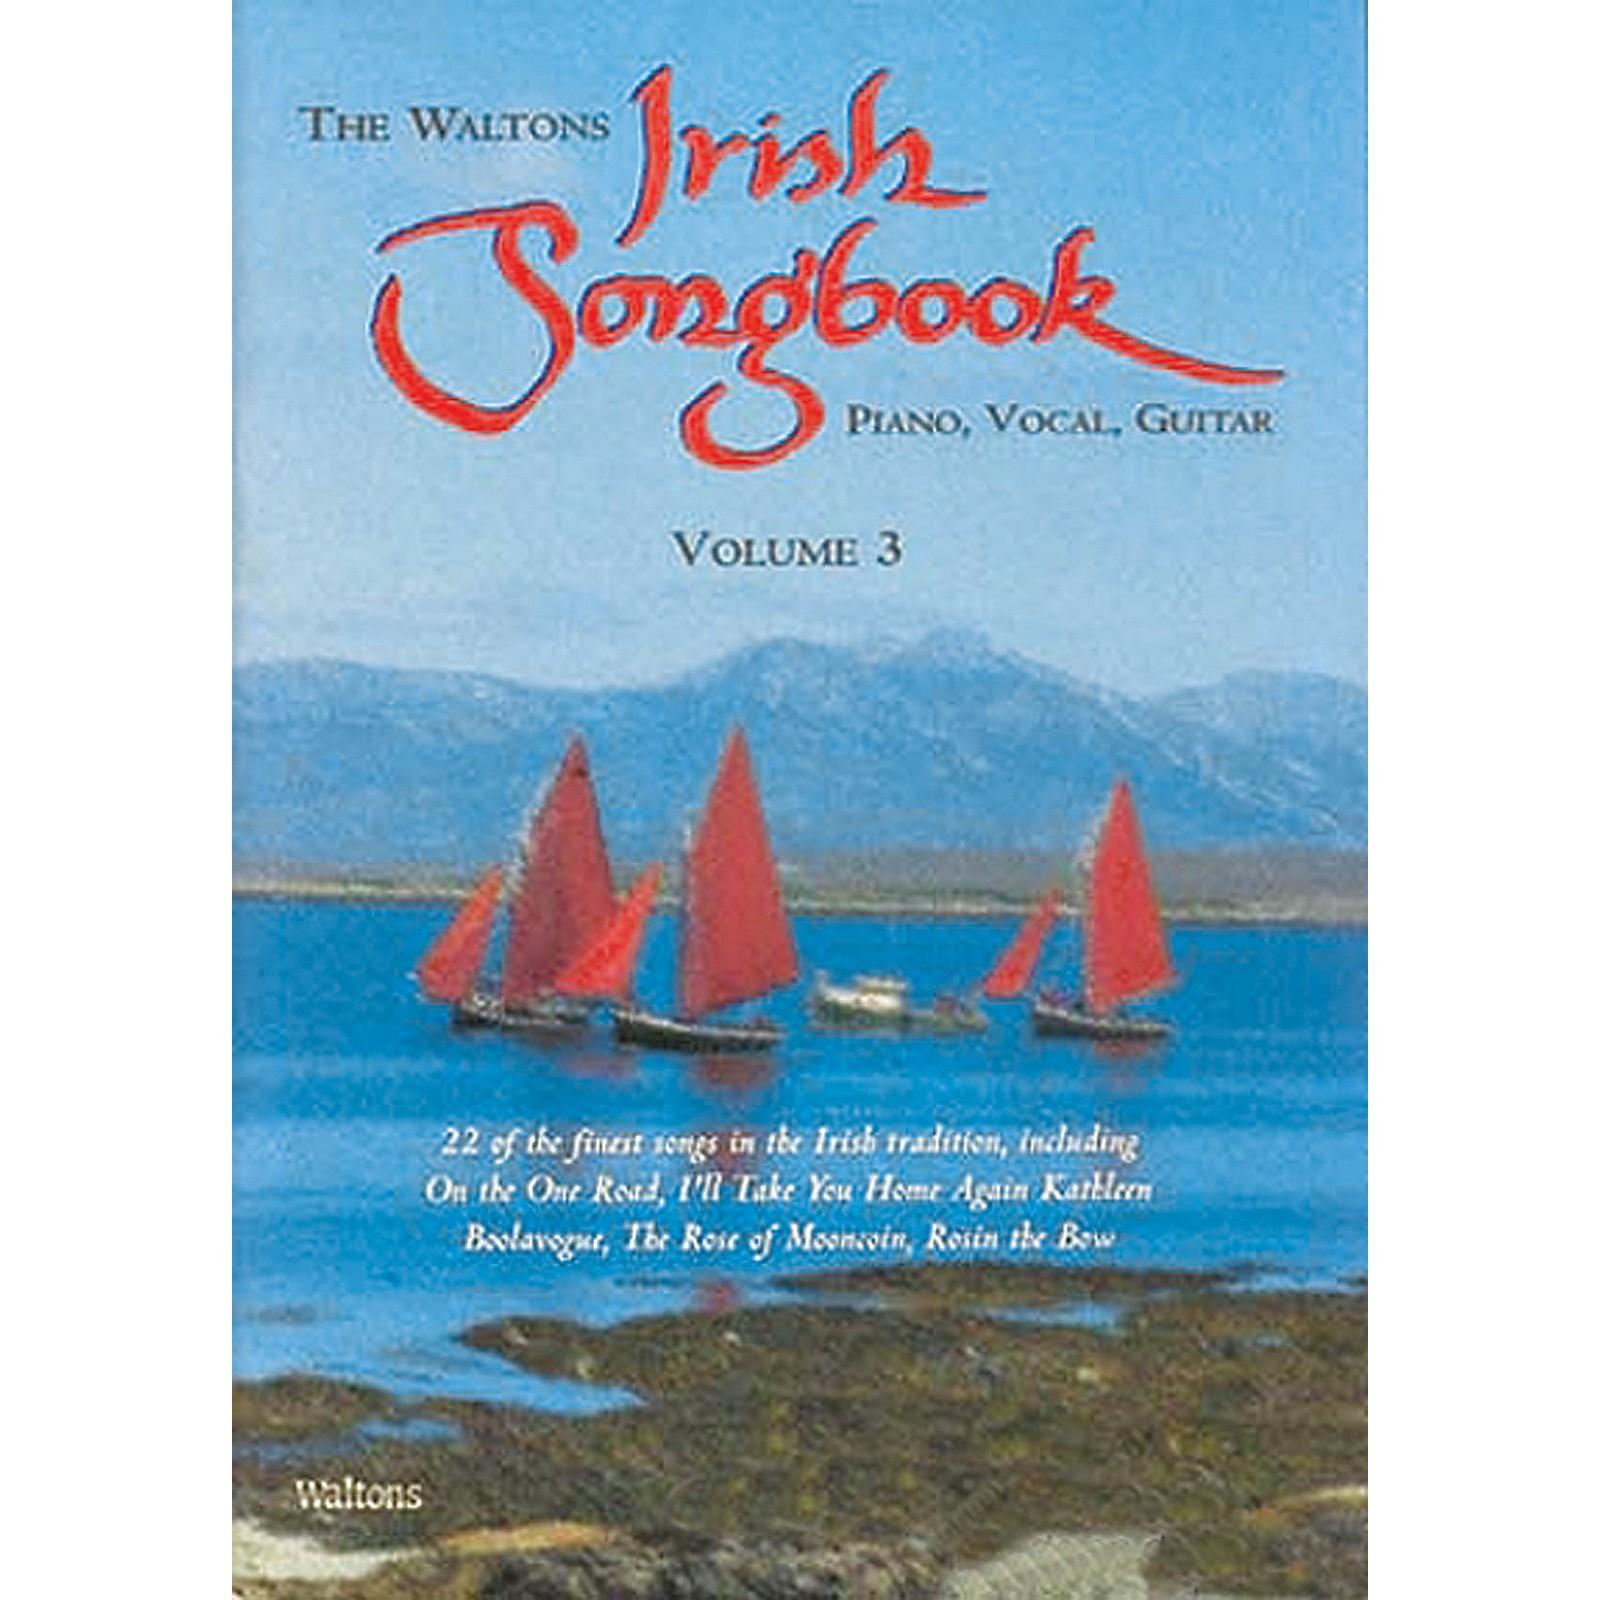 Waltons The Waltons Irish Songbook - Volume 3 Waltons Irish Music Books Series Softcover